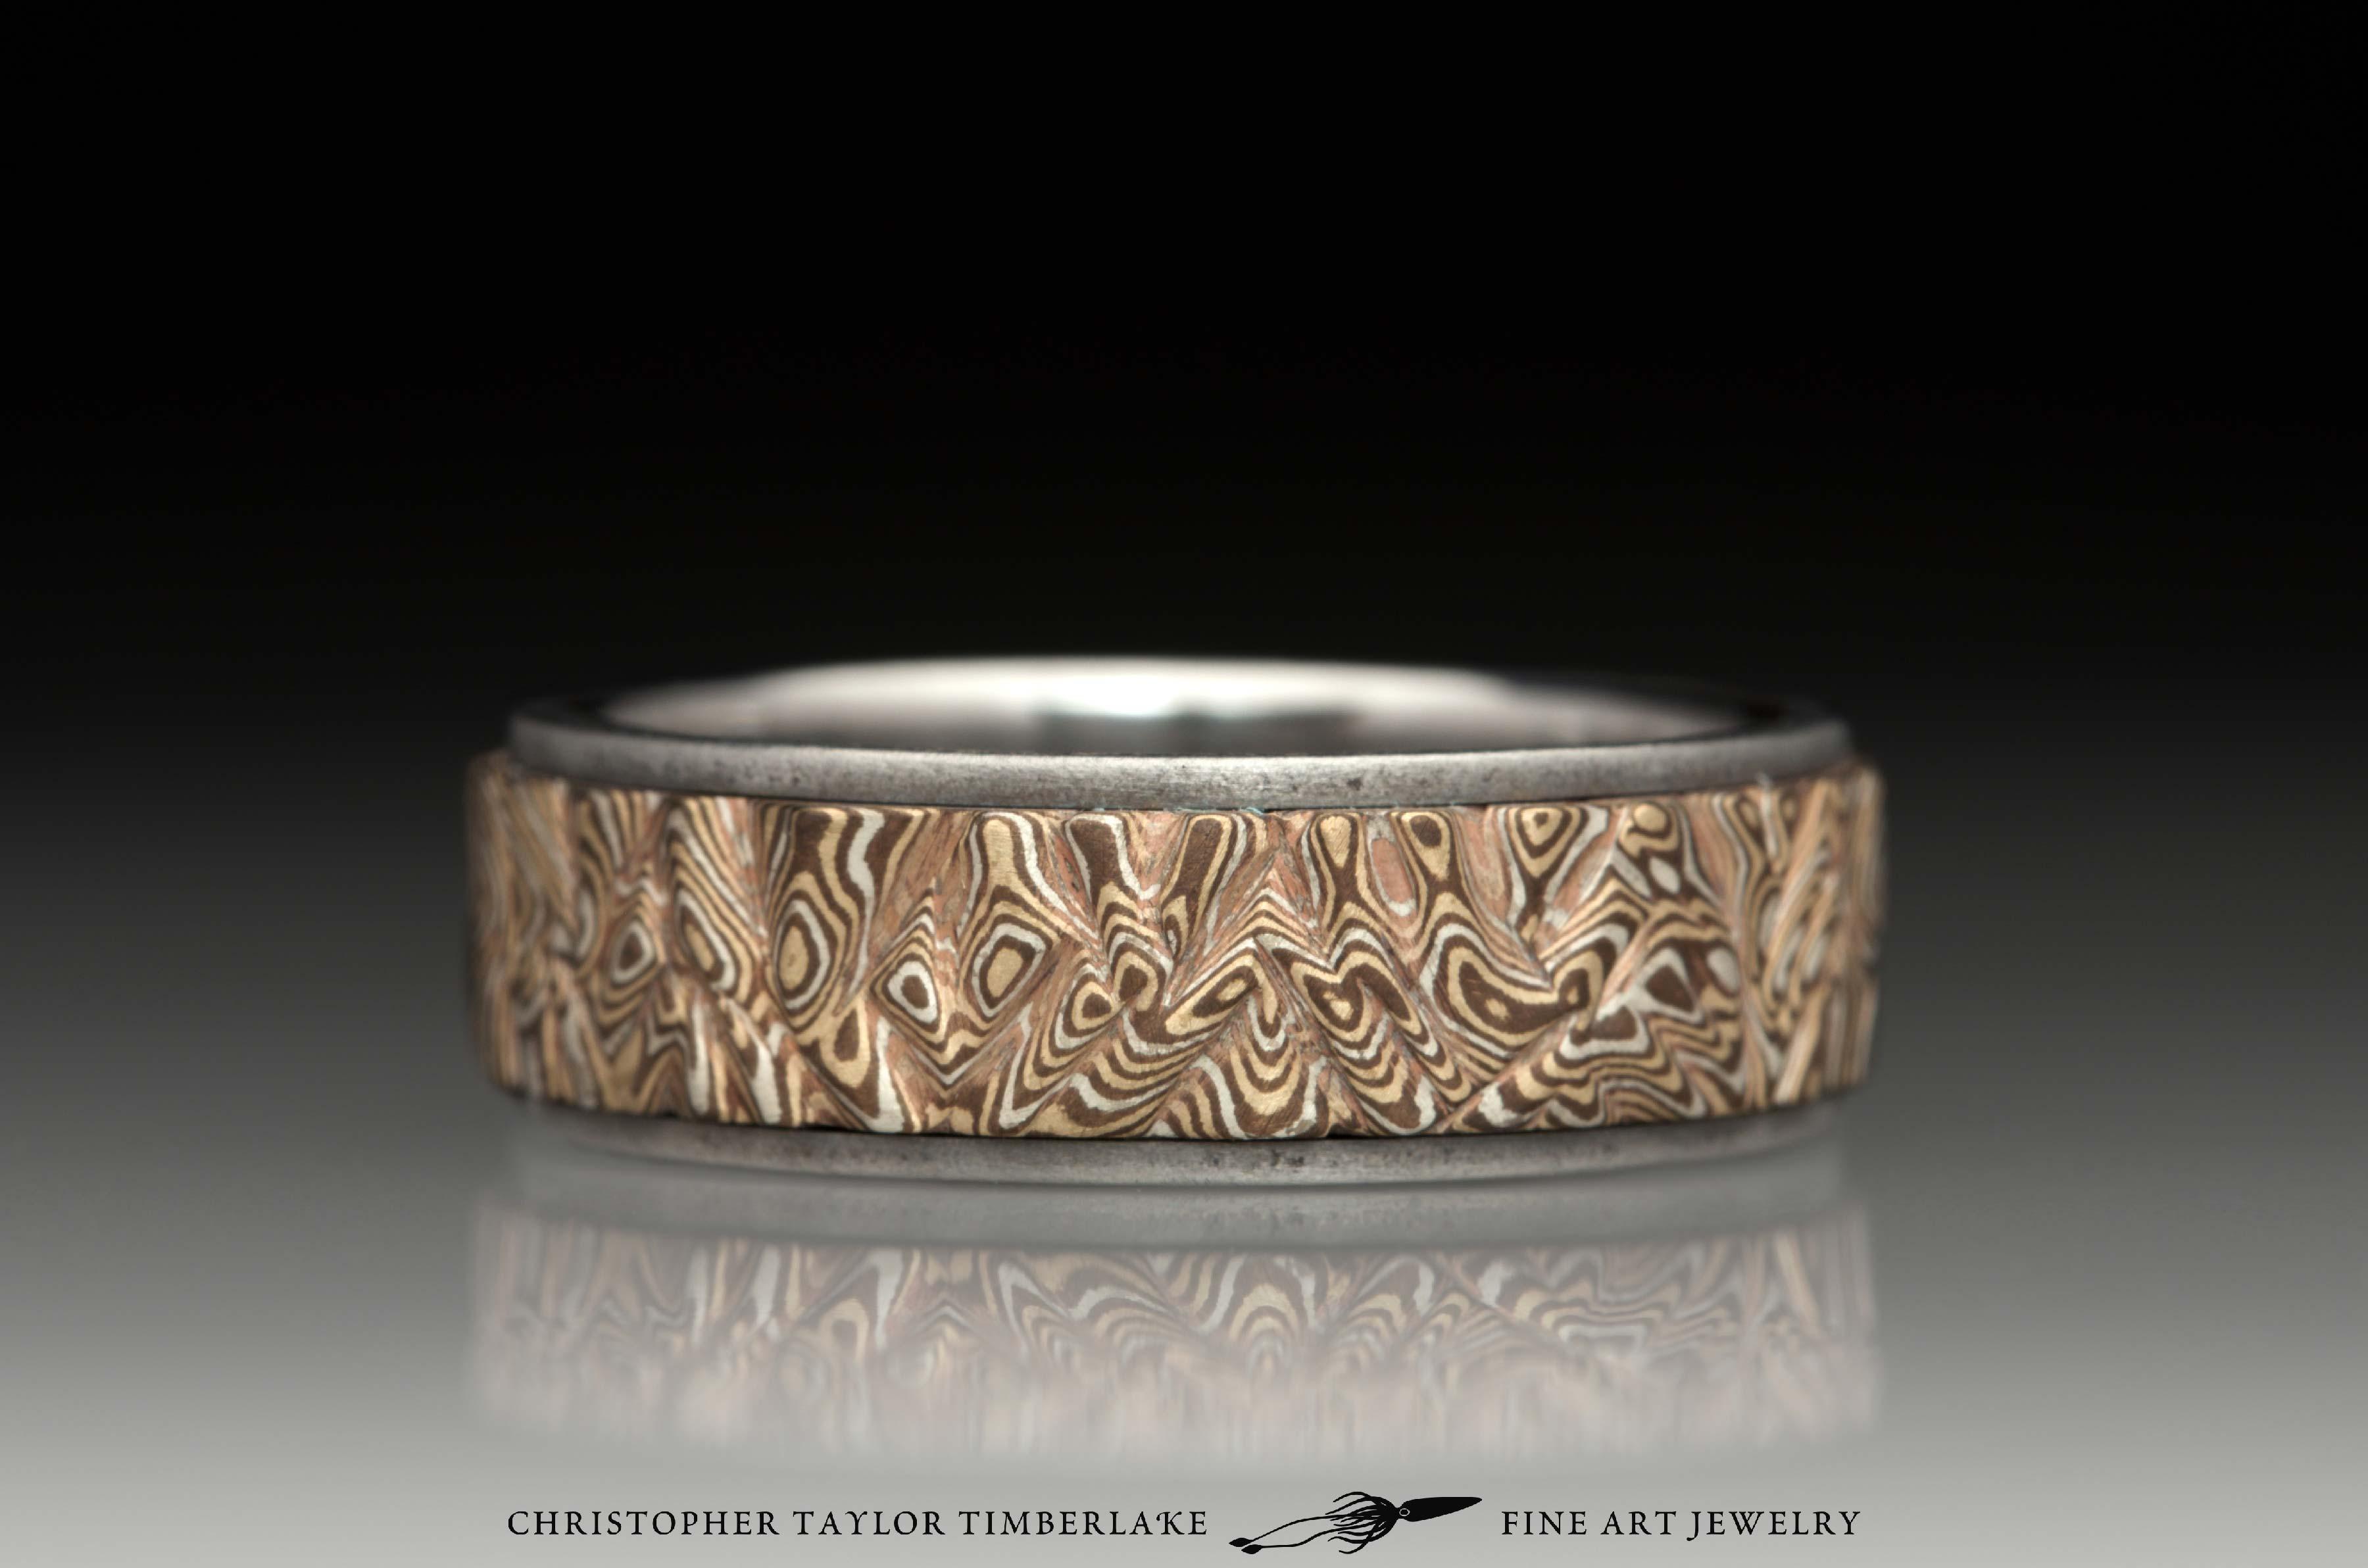 Mokumé-Mokume-Gane-Ring-M90-sterling-silver,-shakudo,-kogane,-stainless-steel-band,-oxidized,-flat-topped,-(1-5-1)-7mm-4